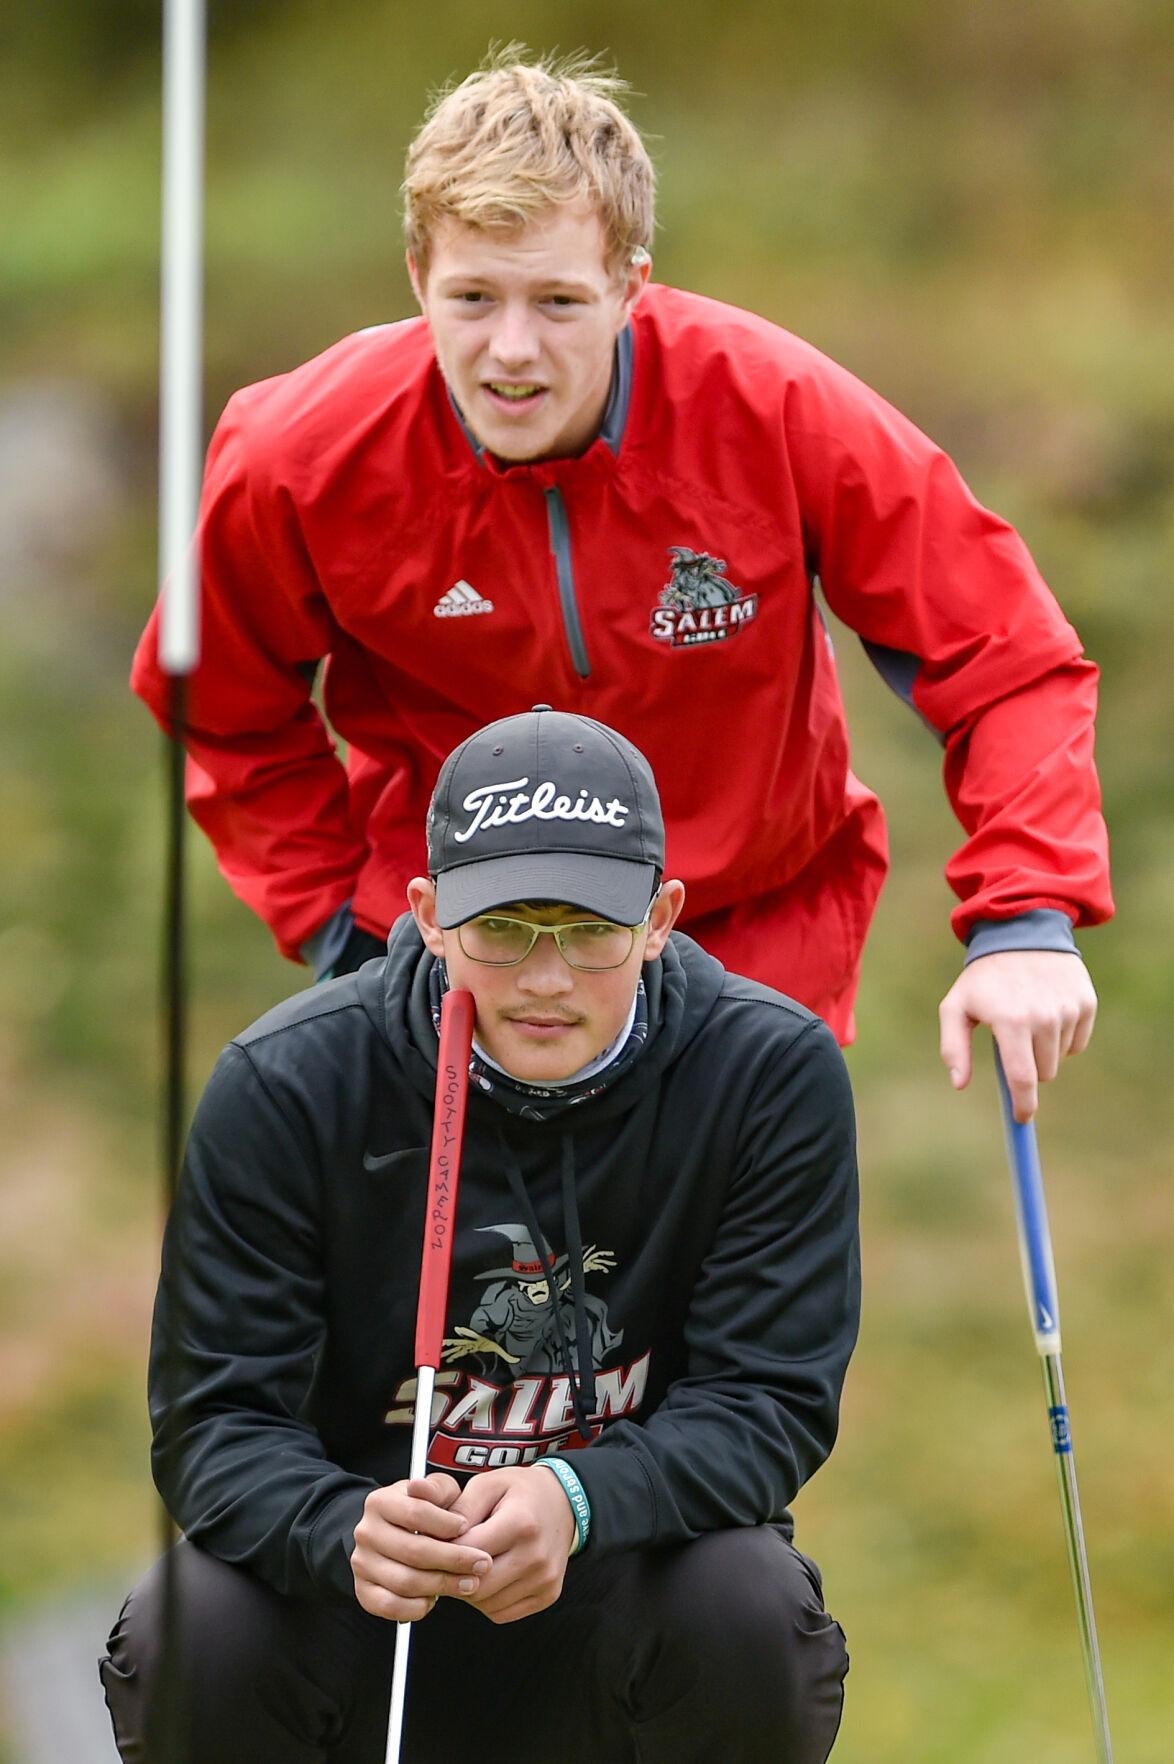 Swampscott vs Salem golf